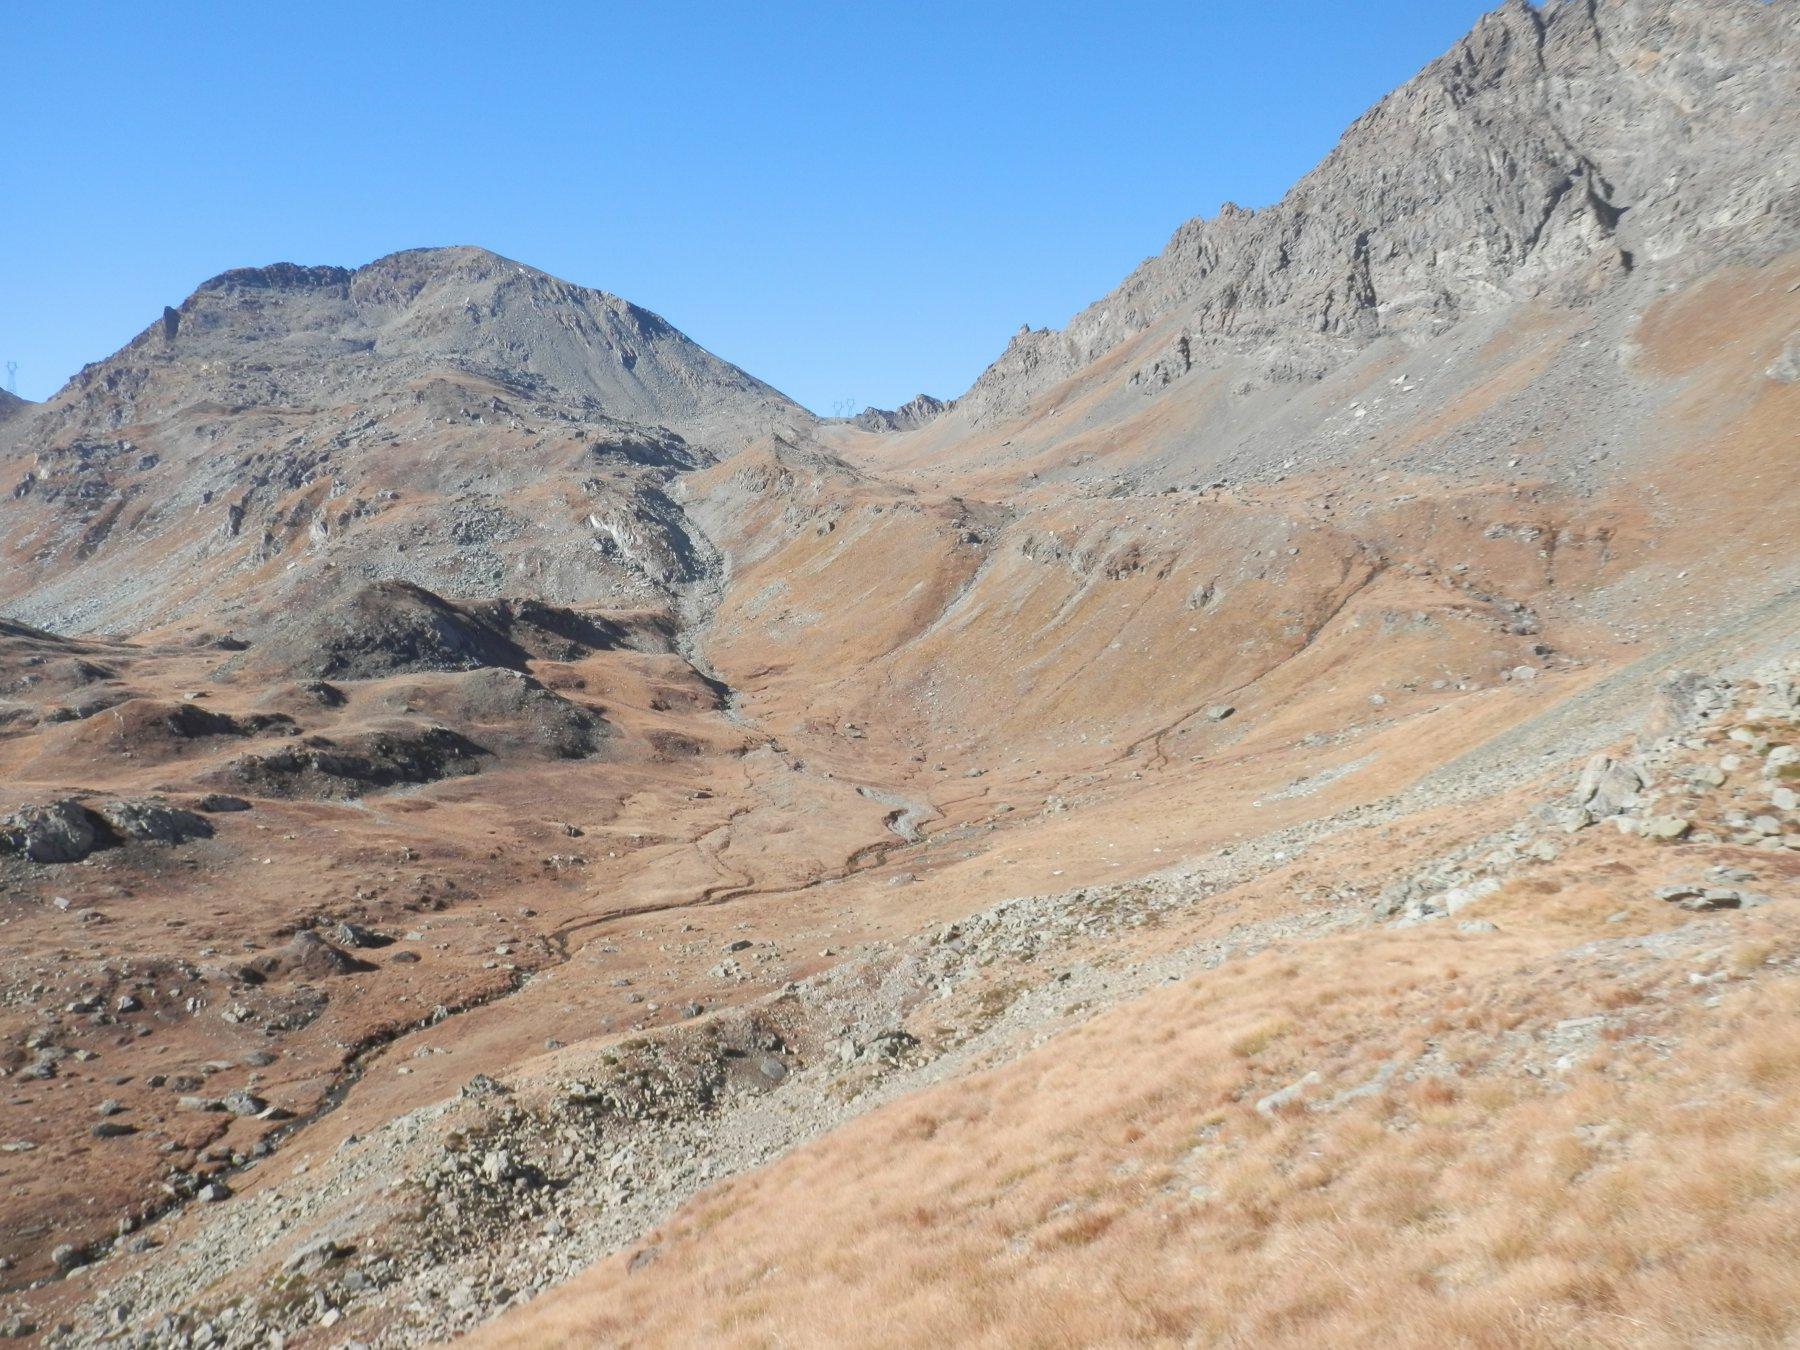 Il lungo traverso verso il colle Pontonnet e la Tour Ponton